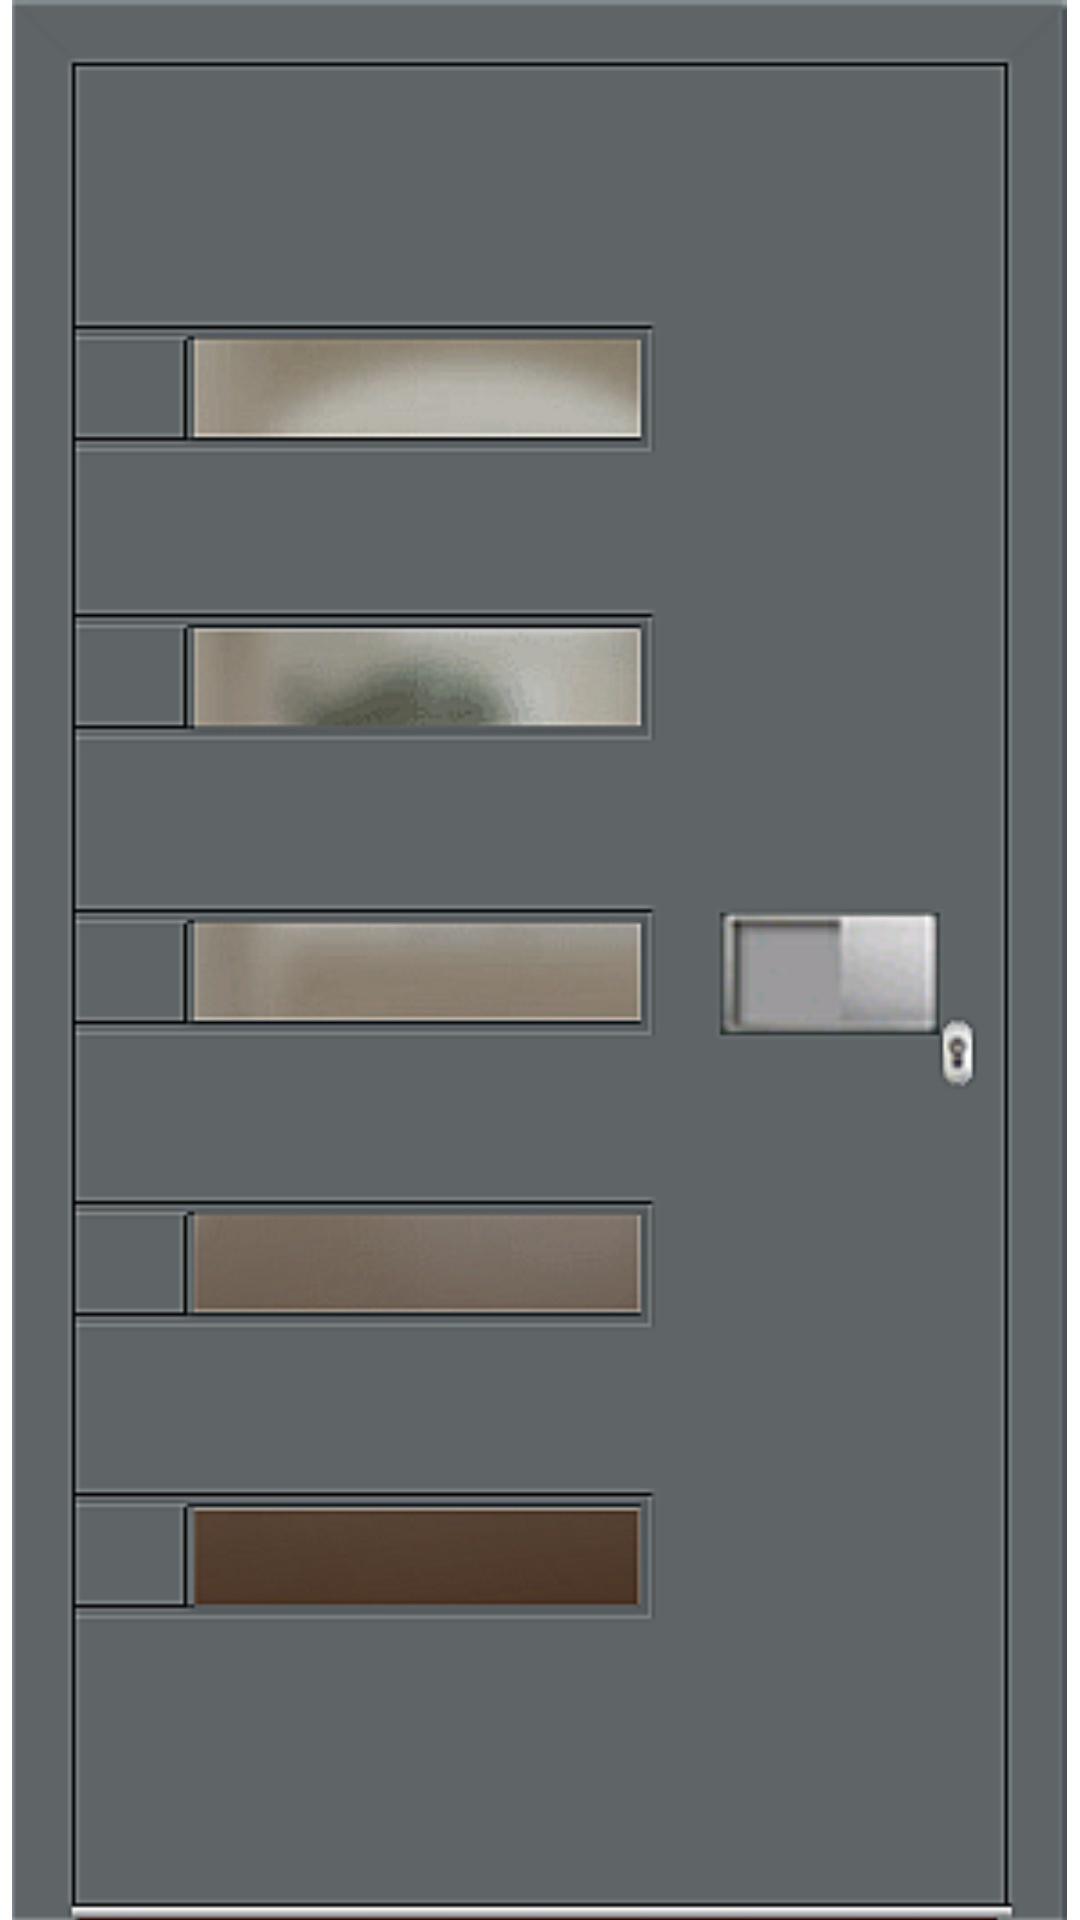 Kunststoff Haustür Modell 6188-52 basaltgrau